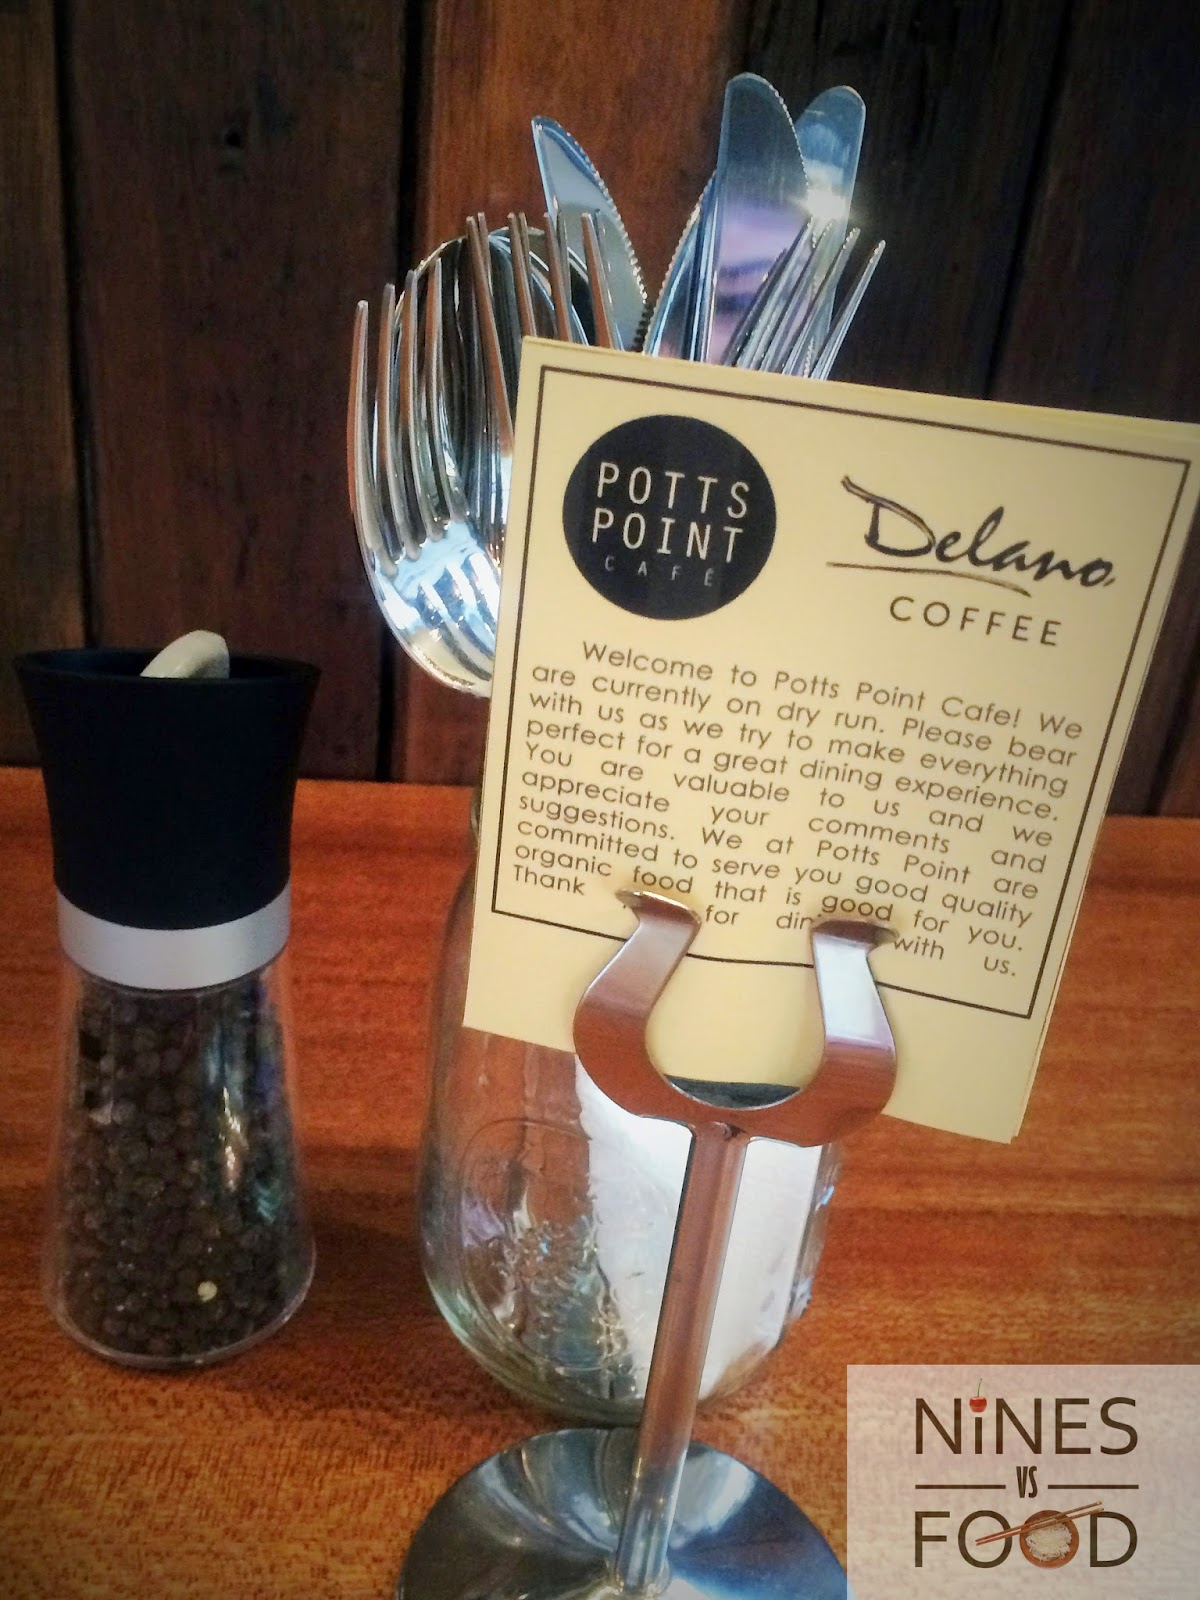 Nines vs. Food - Potts Point Cafe-5.jpg